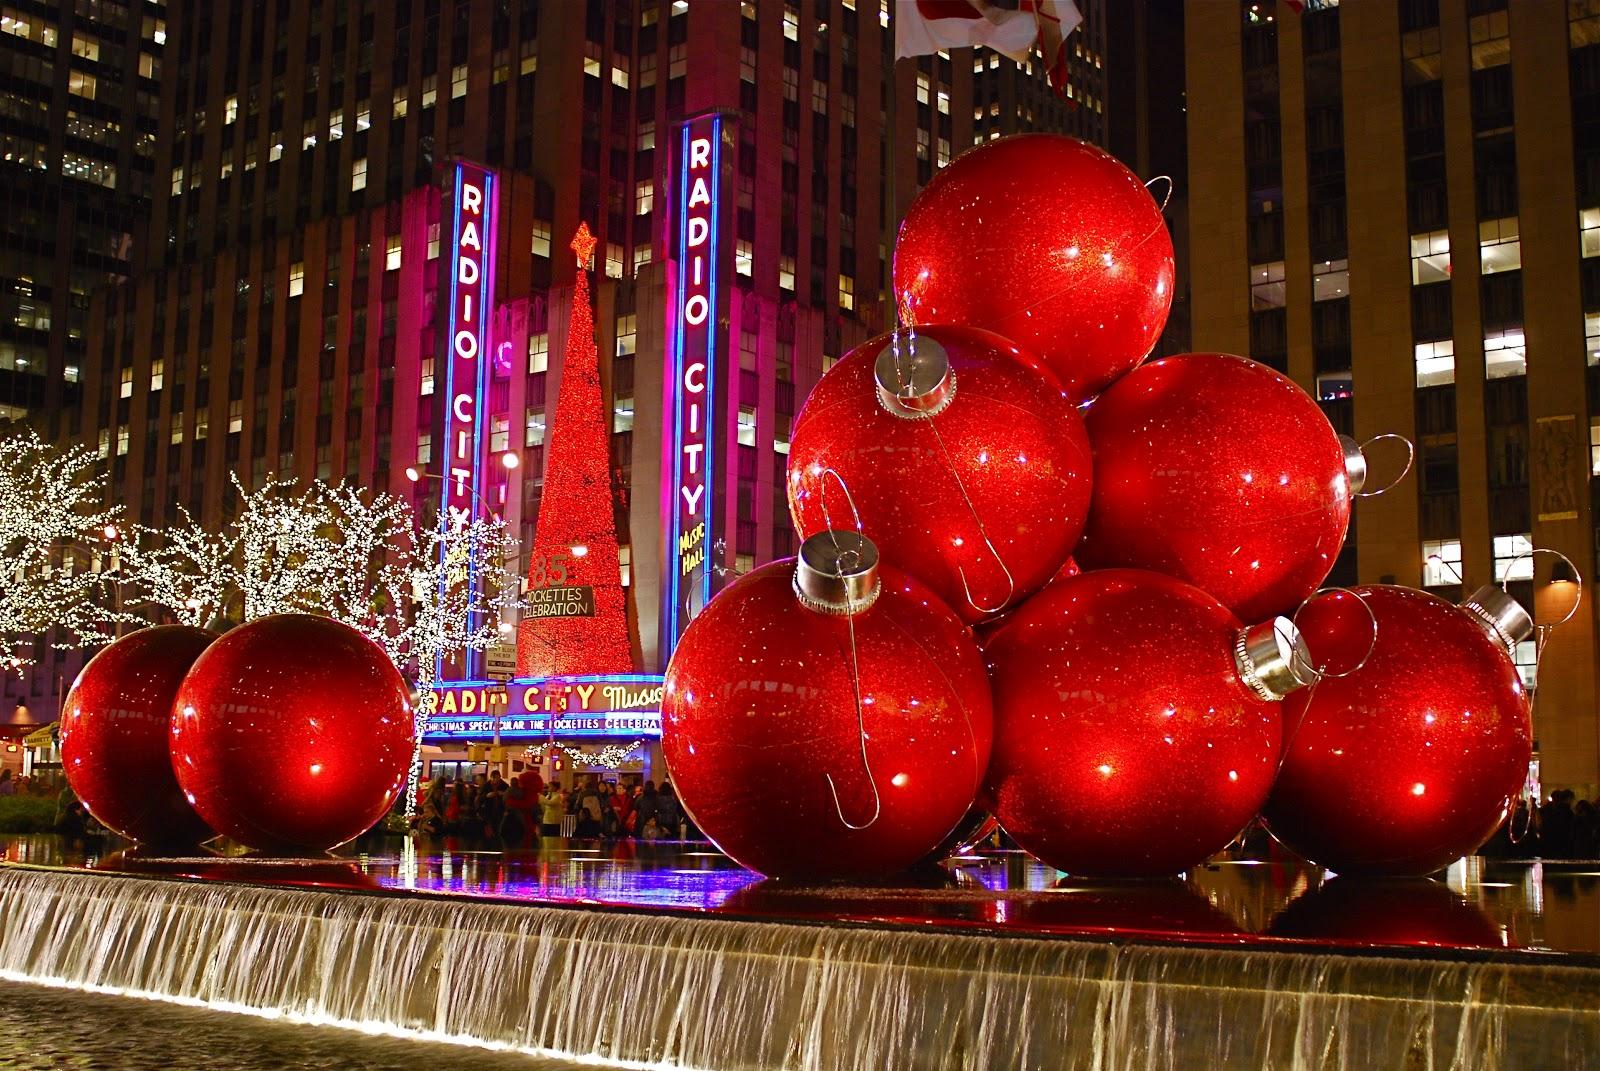 Christmas Decorations: NYC ♥ NYC: Sixth Avenue Christmas Decorations